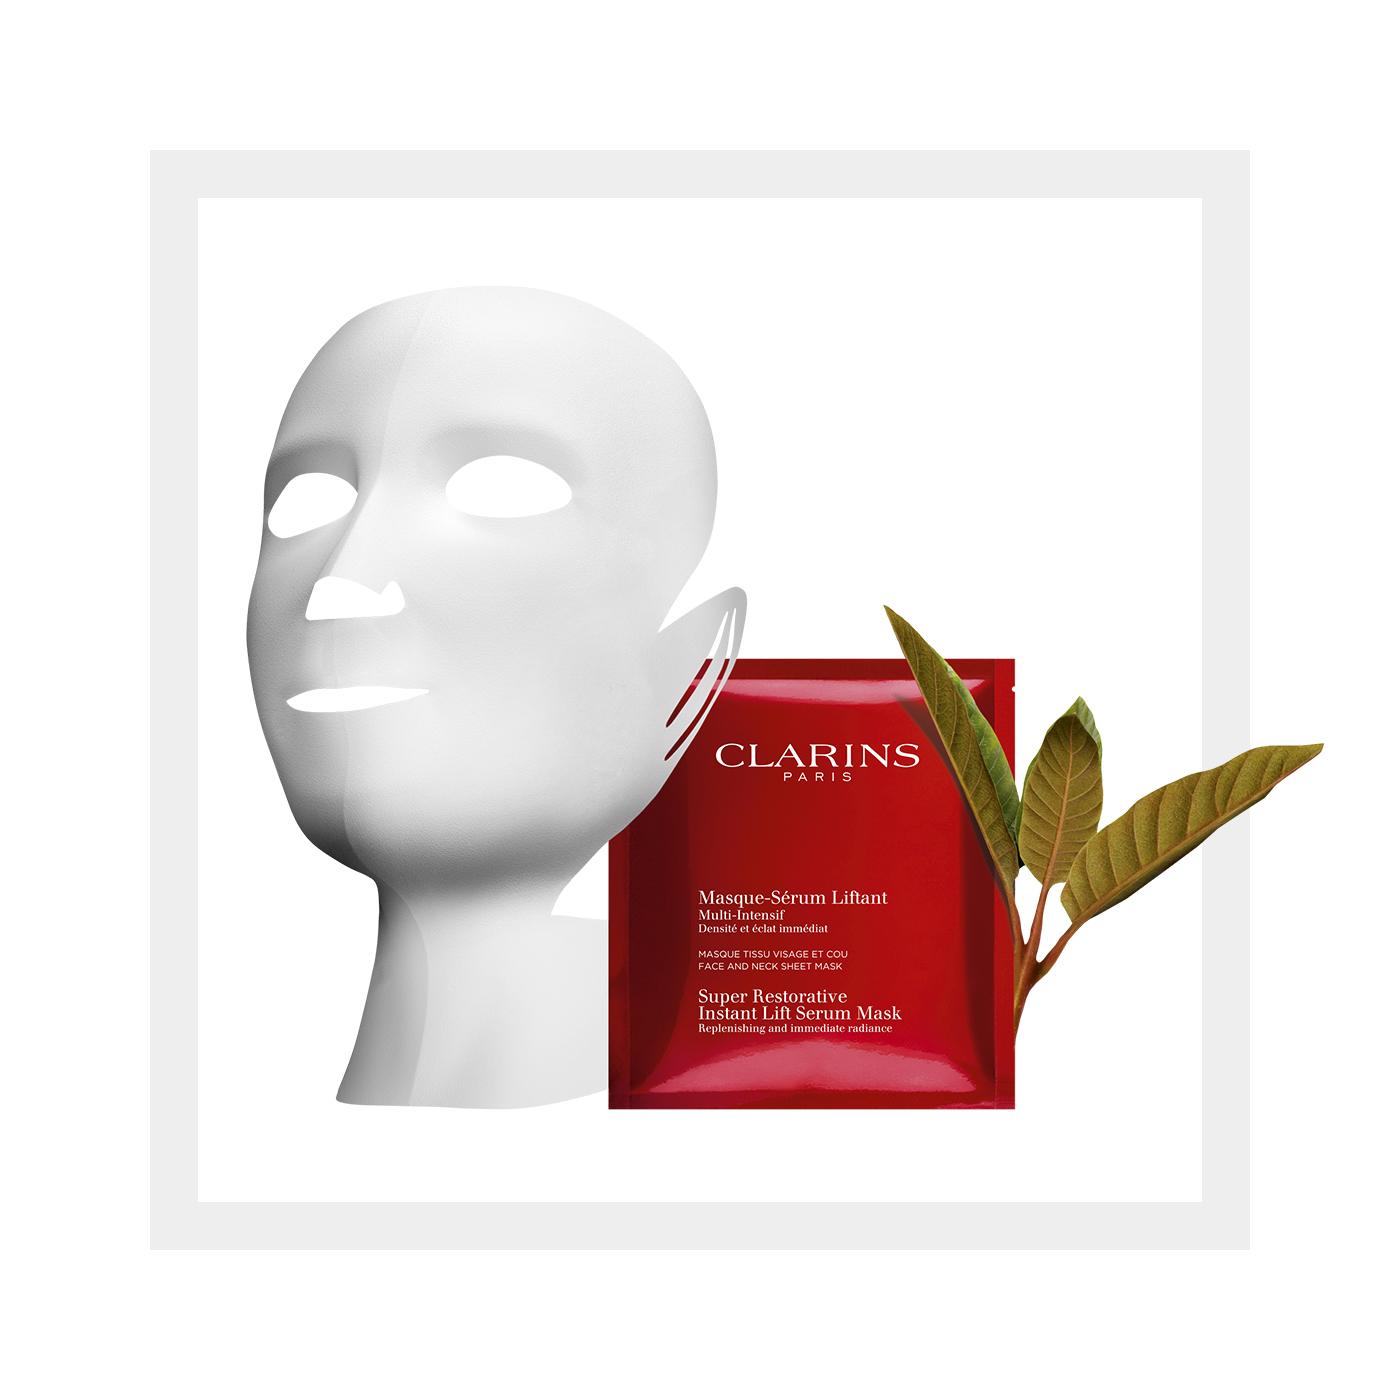 Super Restorative Instant Lift Serum Mask by Clarins #9